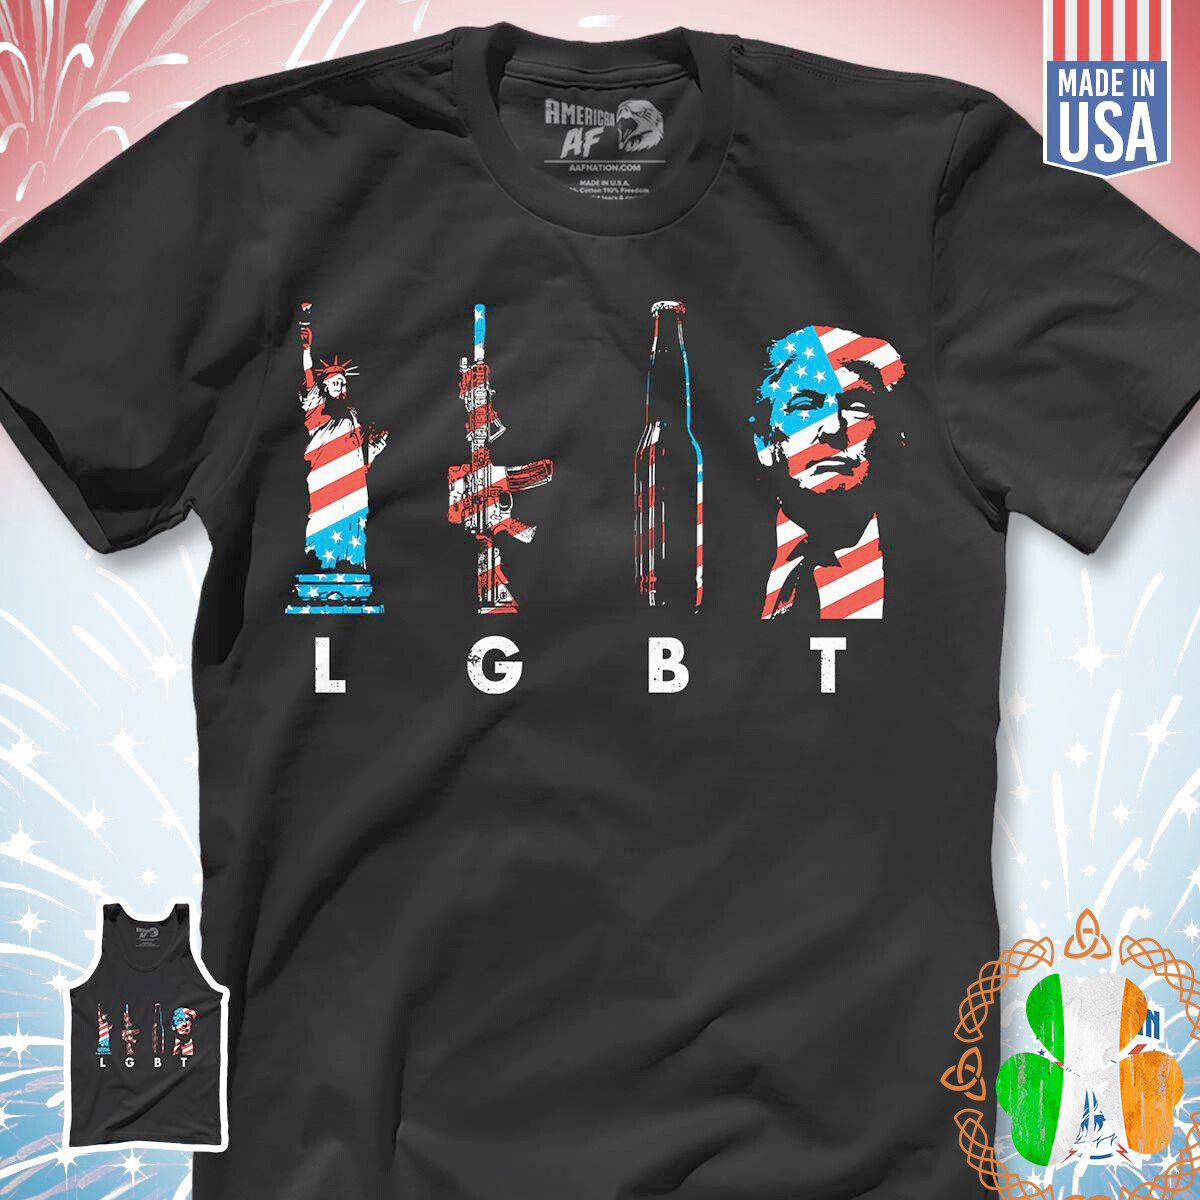 American Style LGBT Liberty Enlightening Gun Beer Trump Shirt